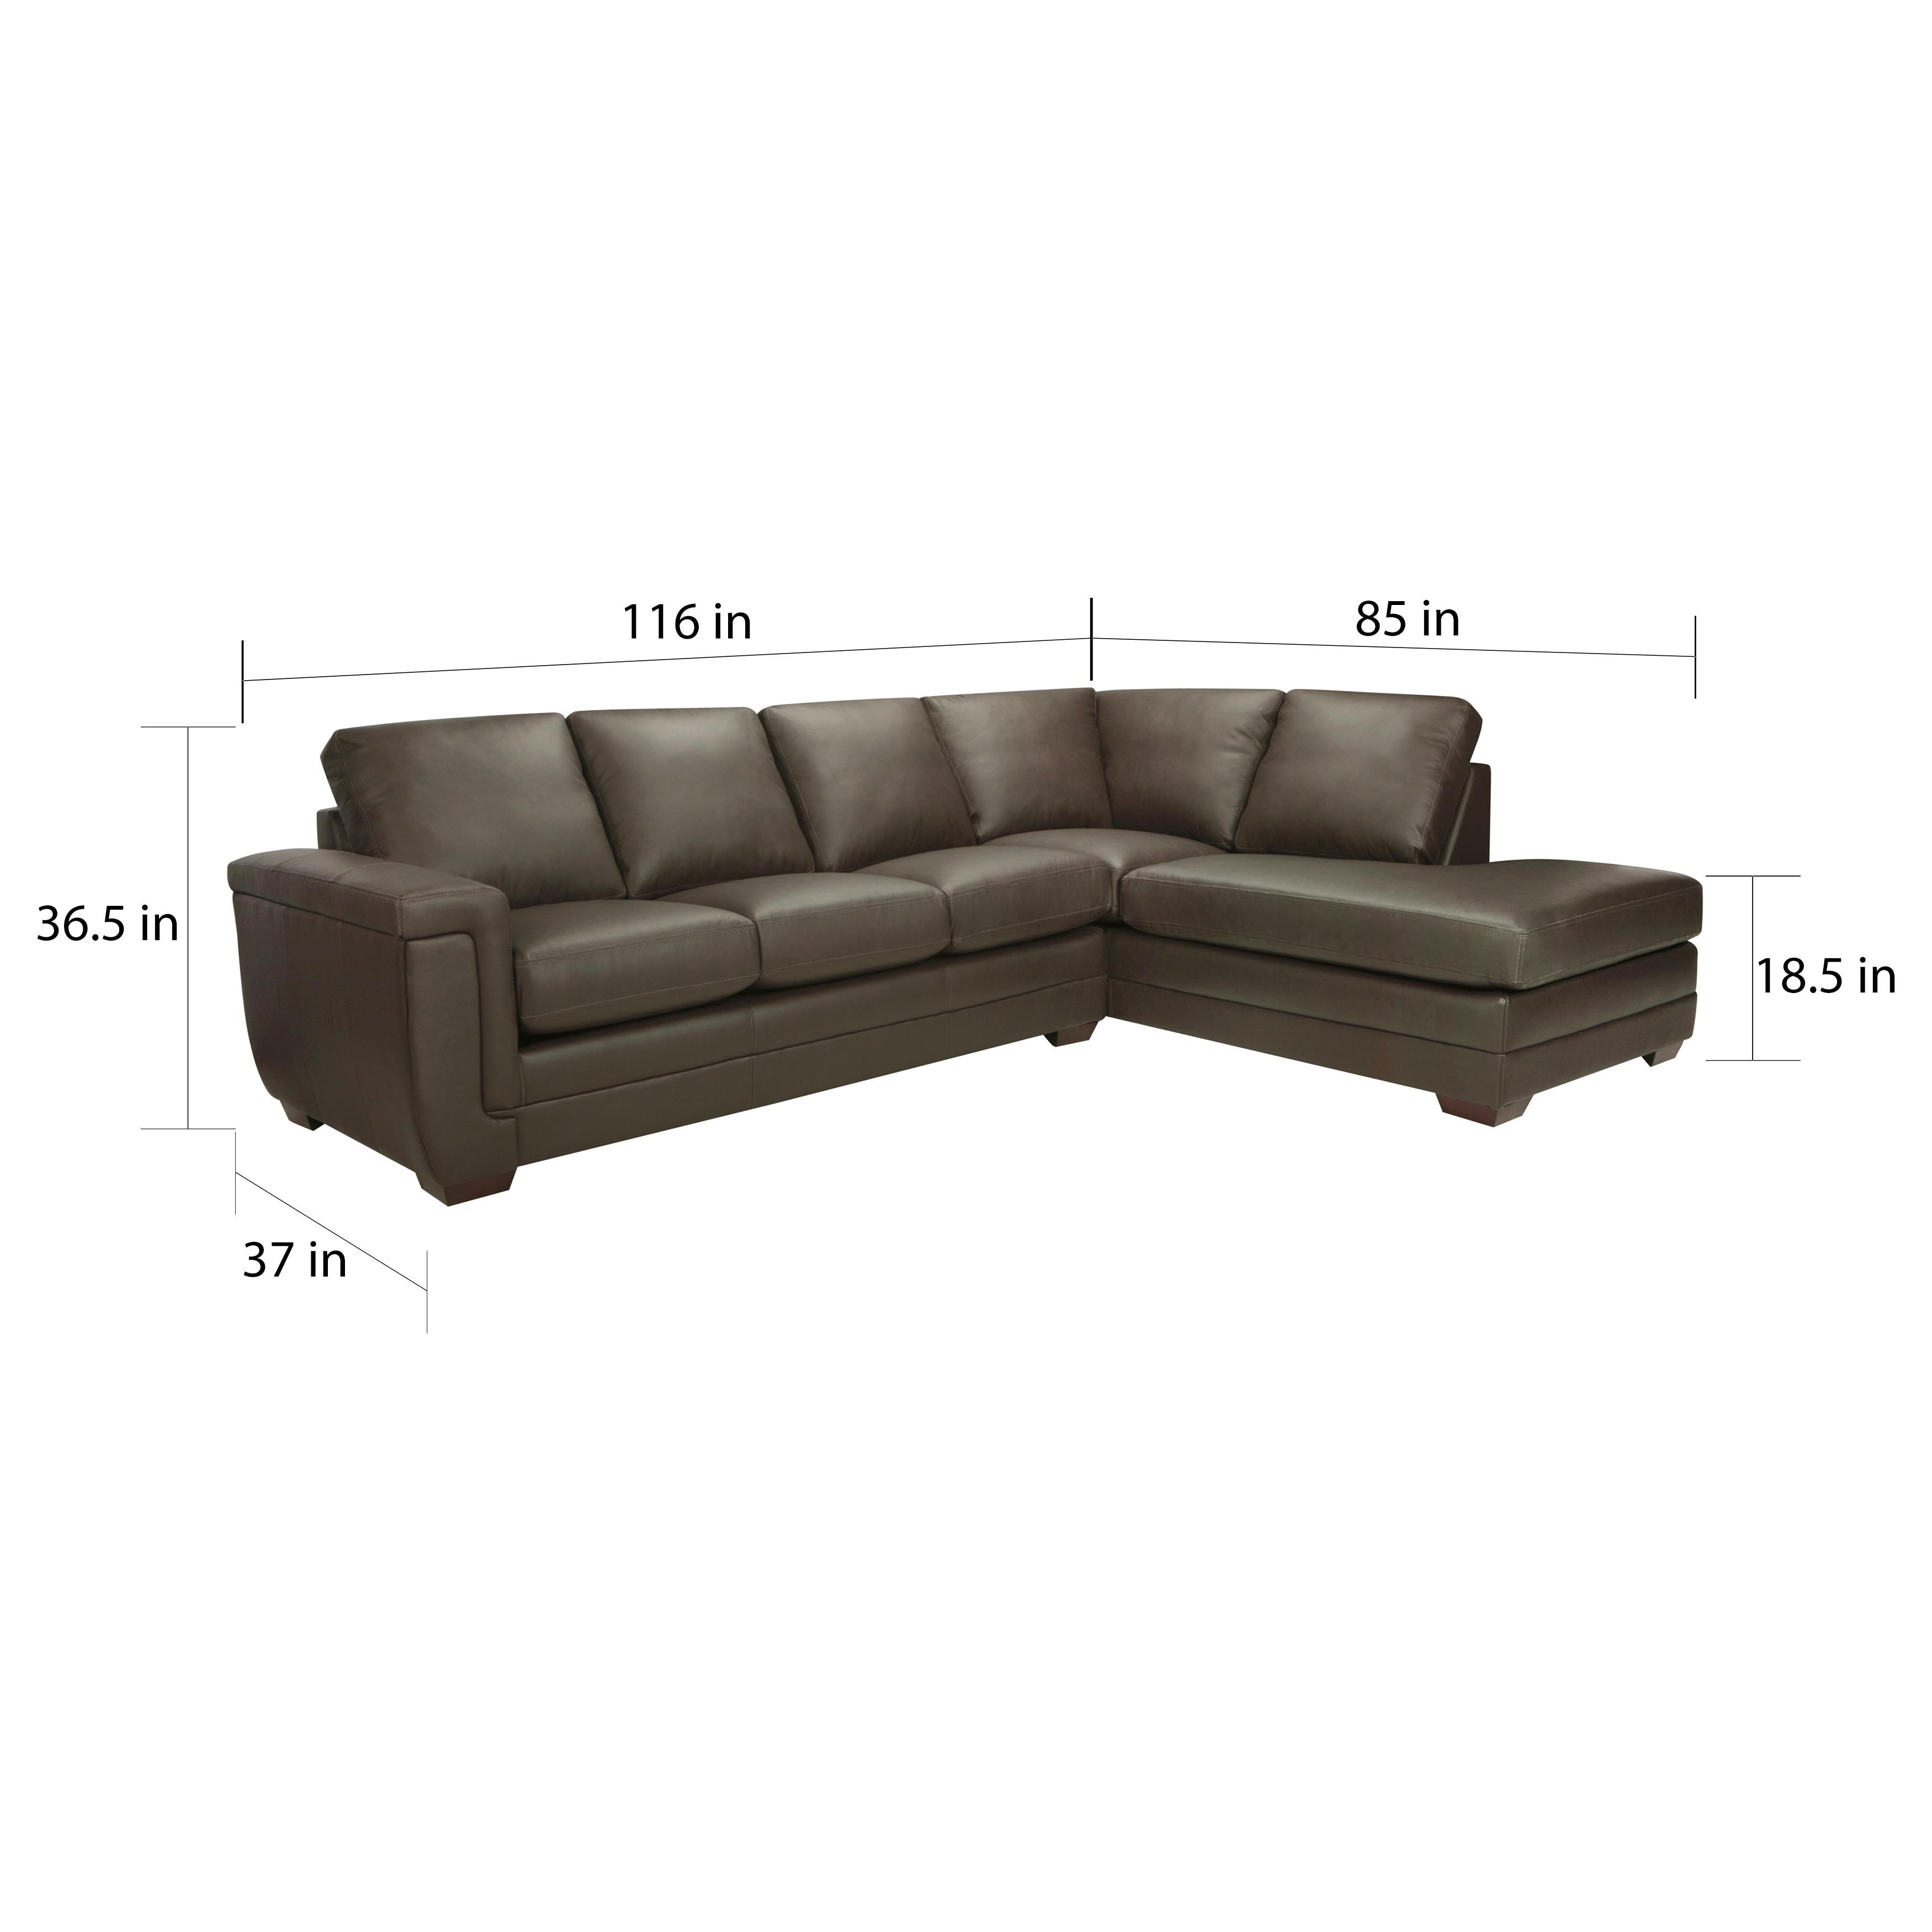 - Shop Porsche Top Grain Italian Leather Sectional Sofa - 36.5 X 116